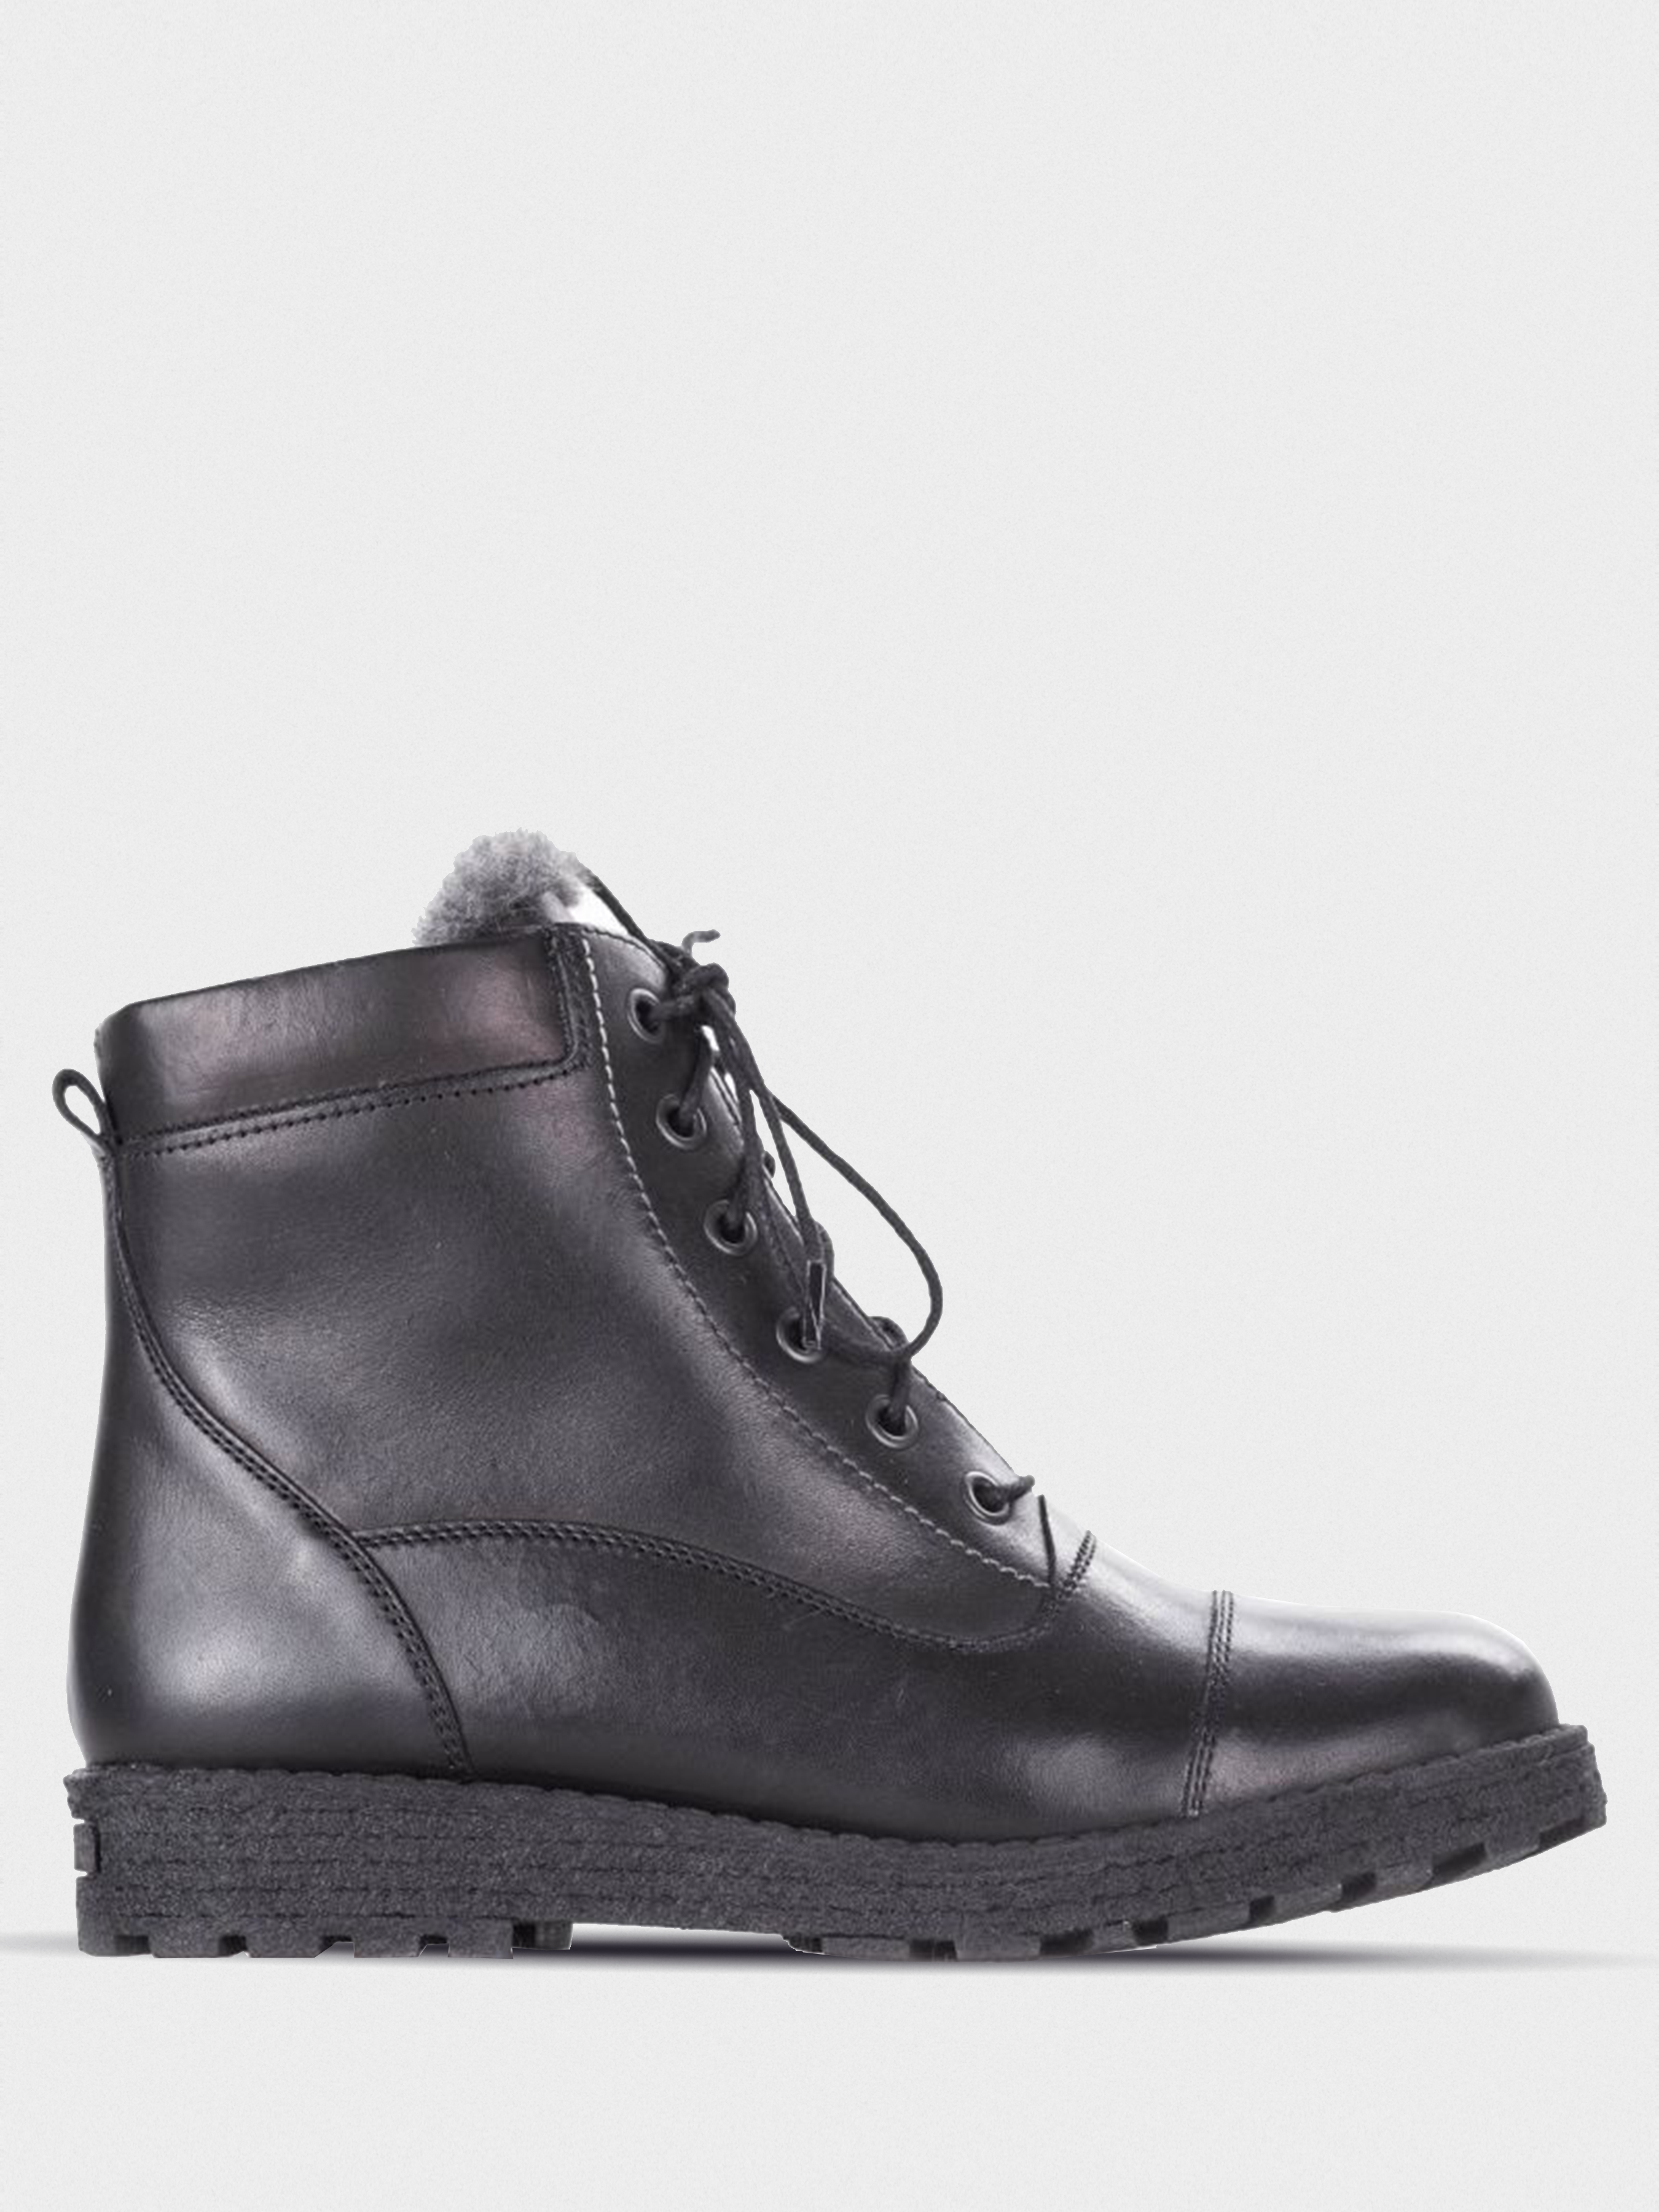 Ботинки детские Braska Кайрос AE168 размеры обуви, 2017